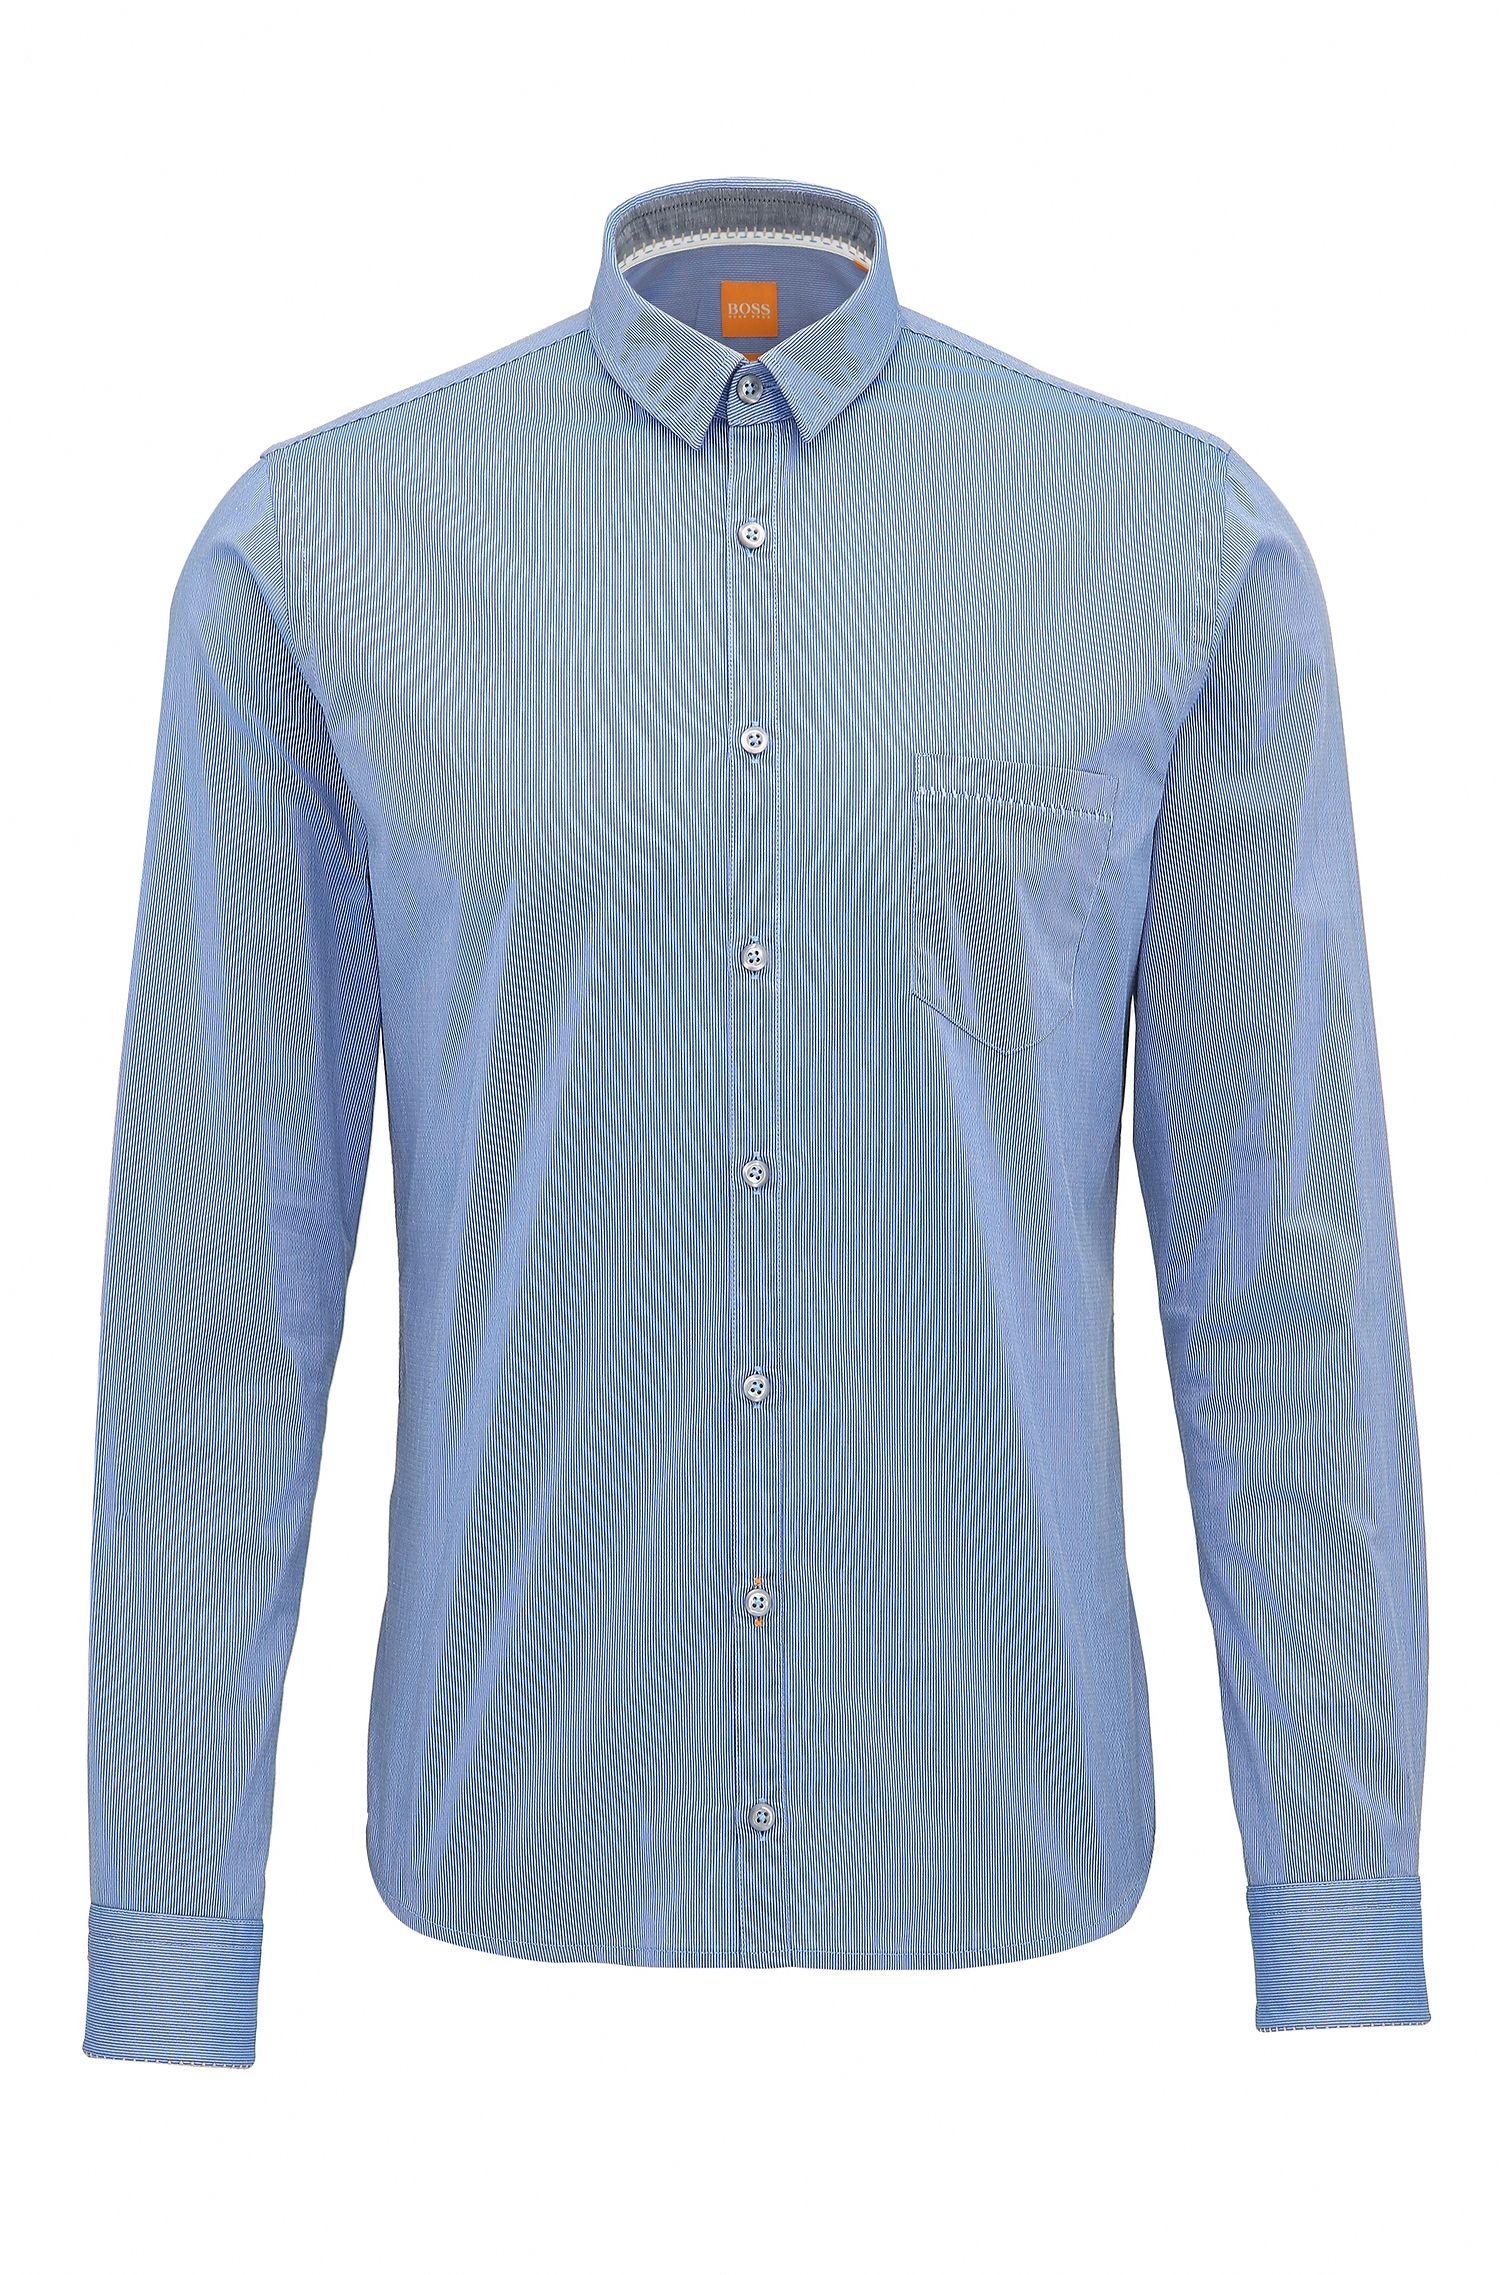 Dobby Cotton Button-Down Shirt, Extra Slim Fit   Eglam